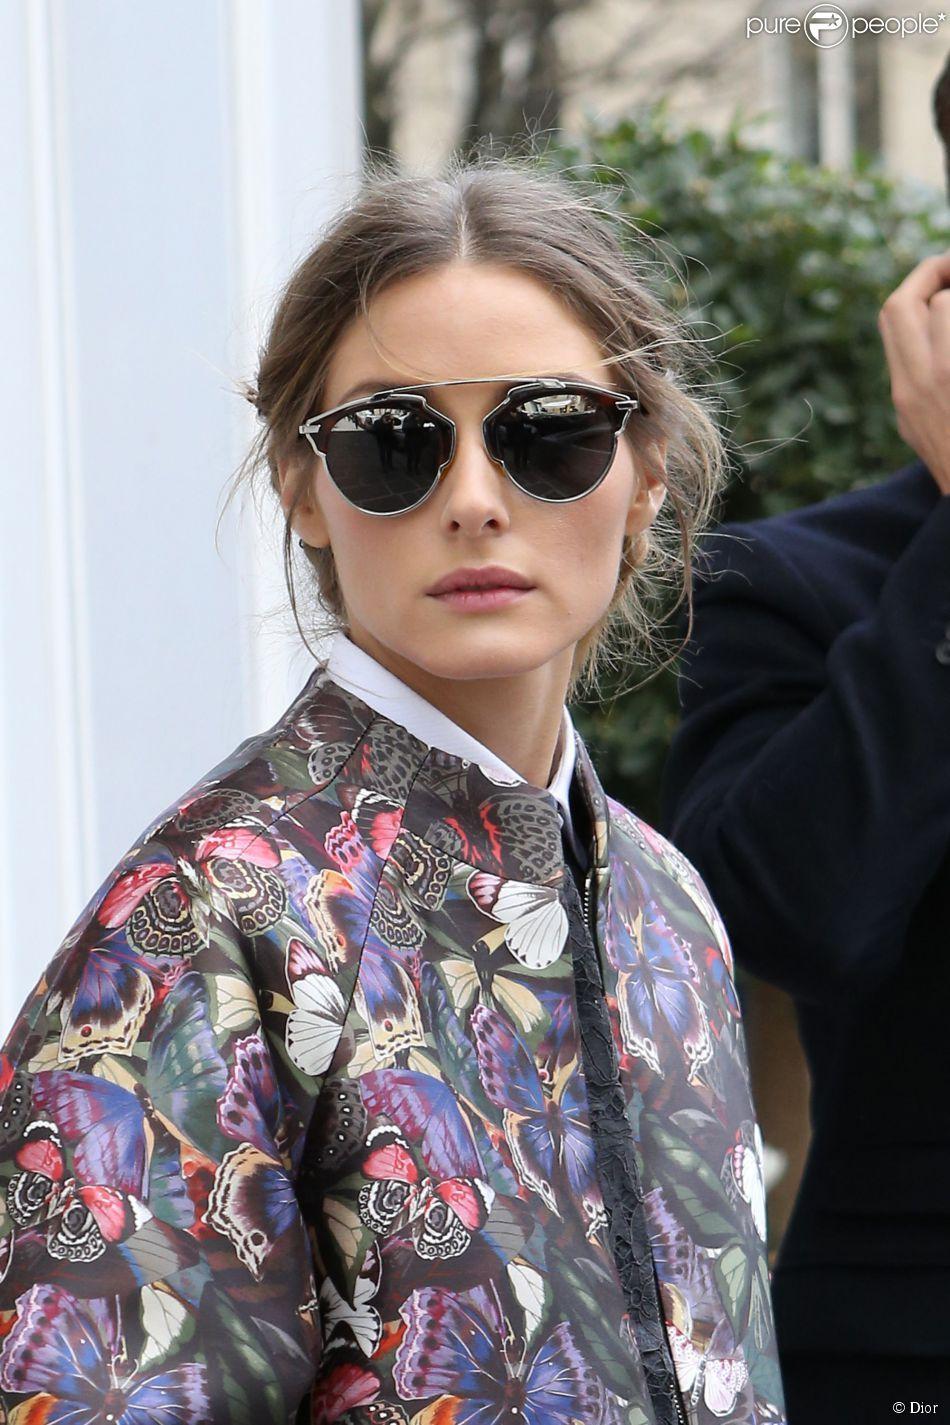 c9cd8cffb3 Dior So Real | Sunglasses | Dior so real sunglasses, Dior sunglasses ...